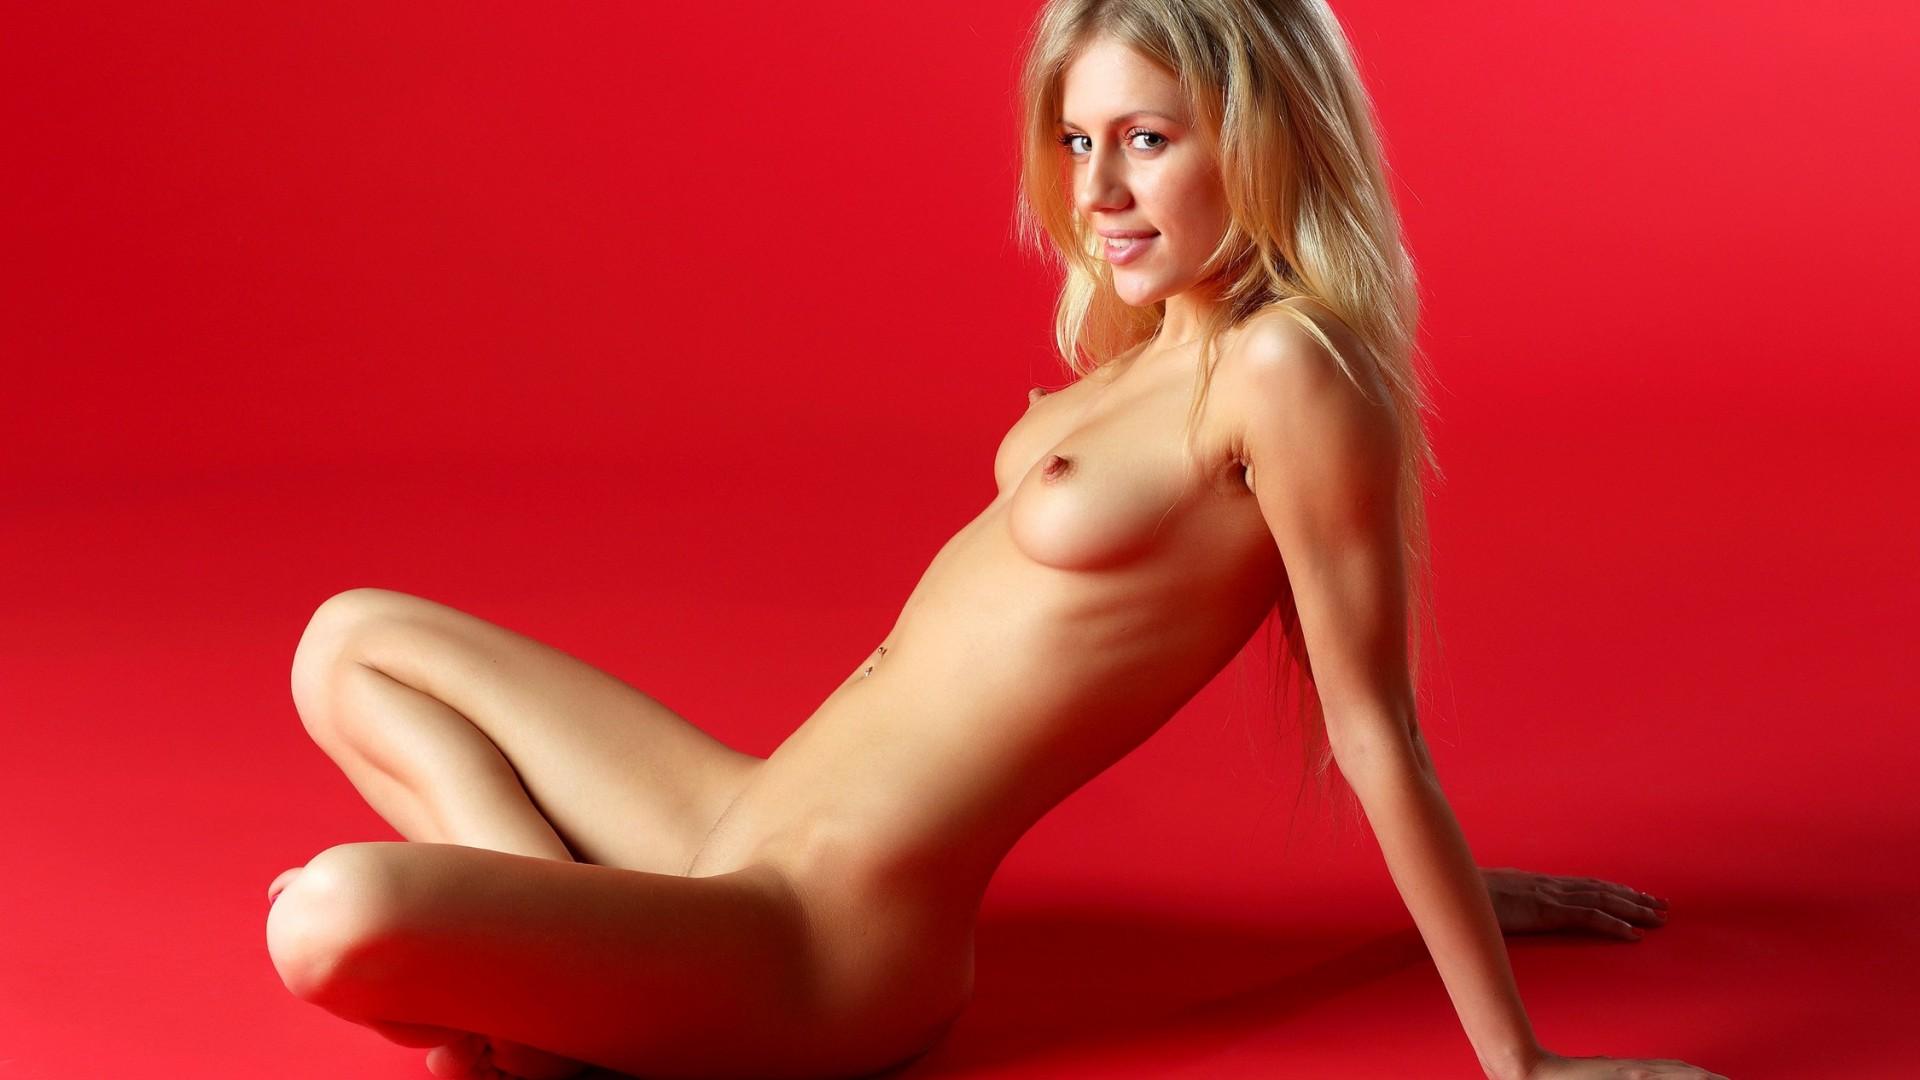 Видео онлайн tamara голые девушки jadi hd